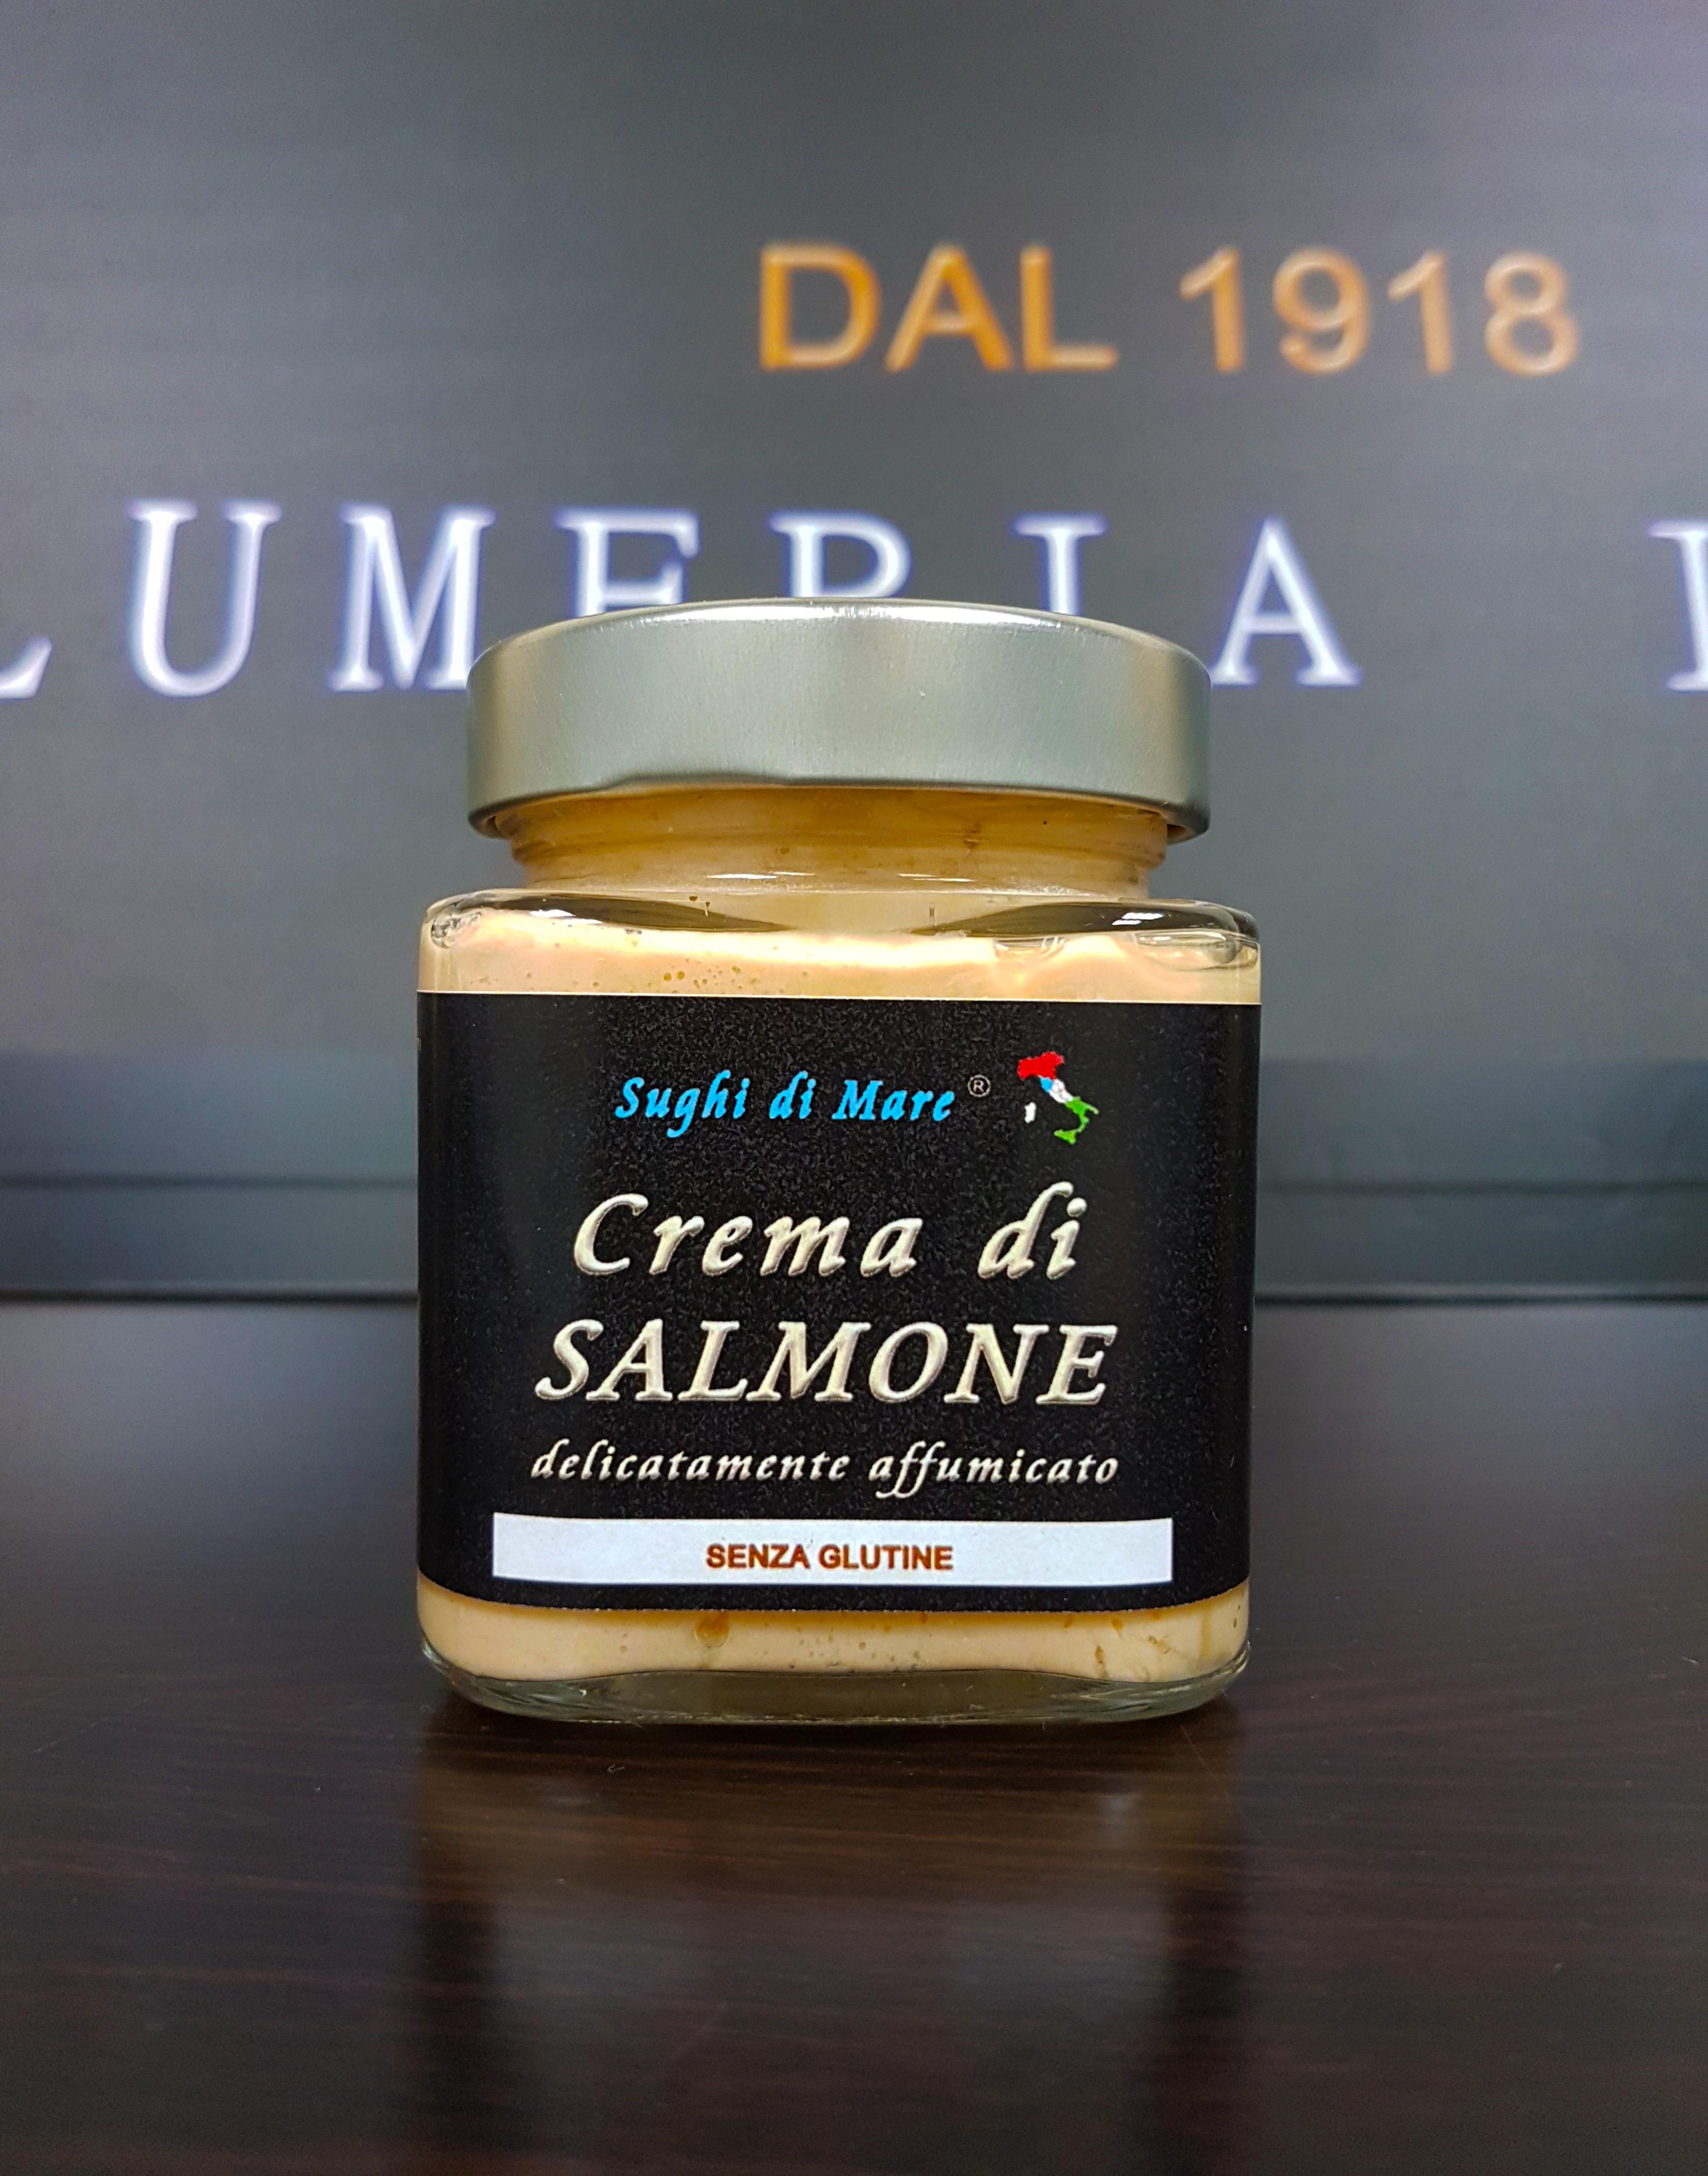 Crema di Salmone